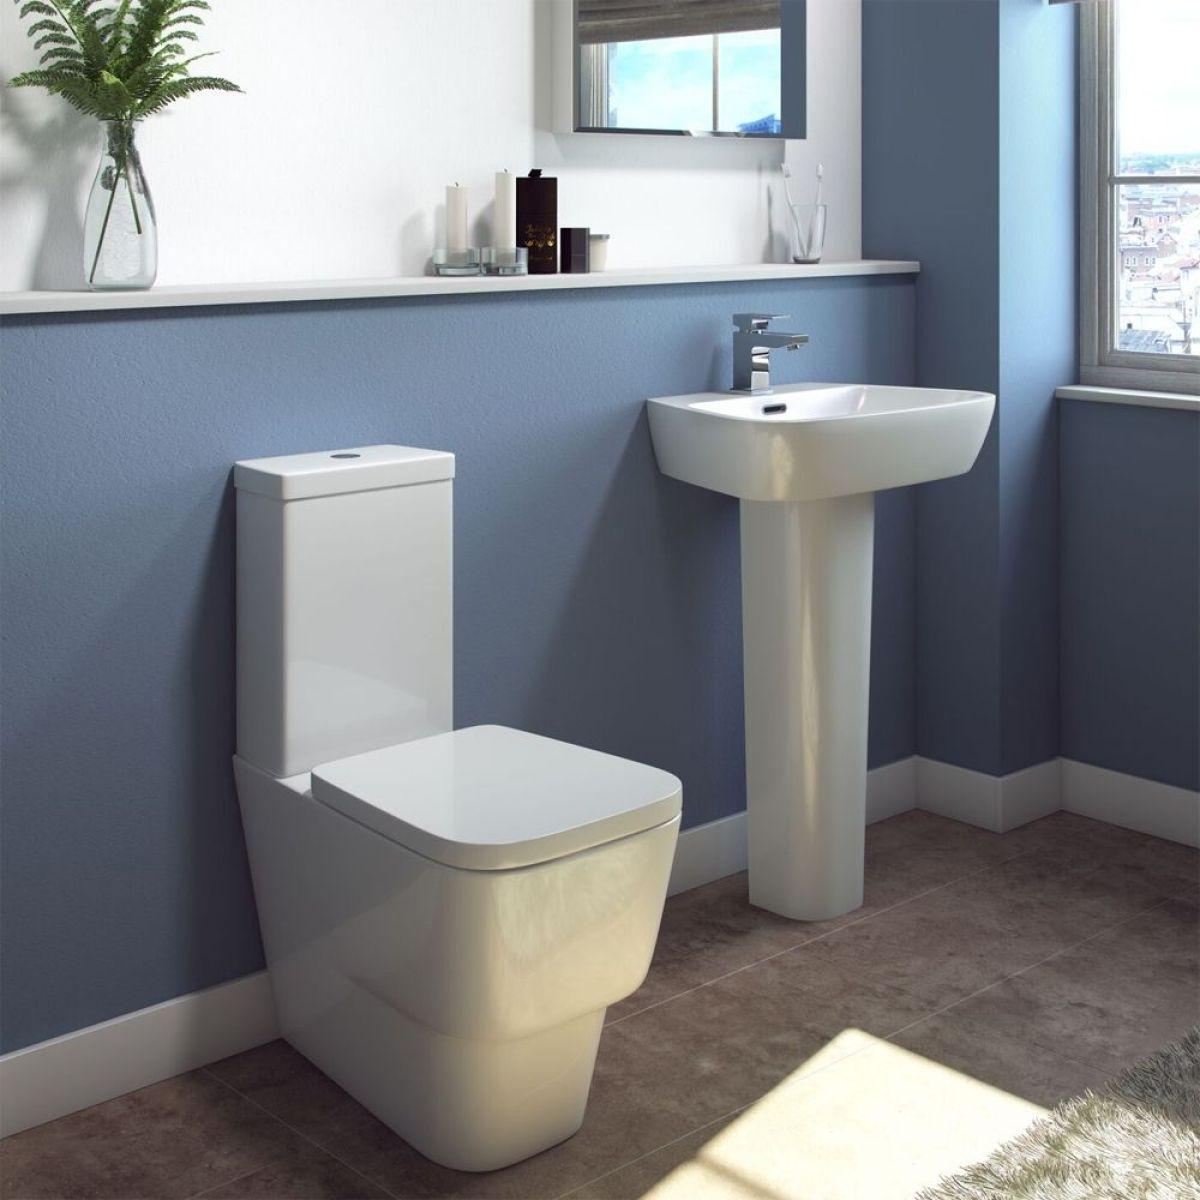 Cassellie Dearne Toilet and Basin Set